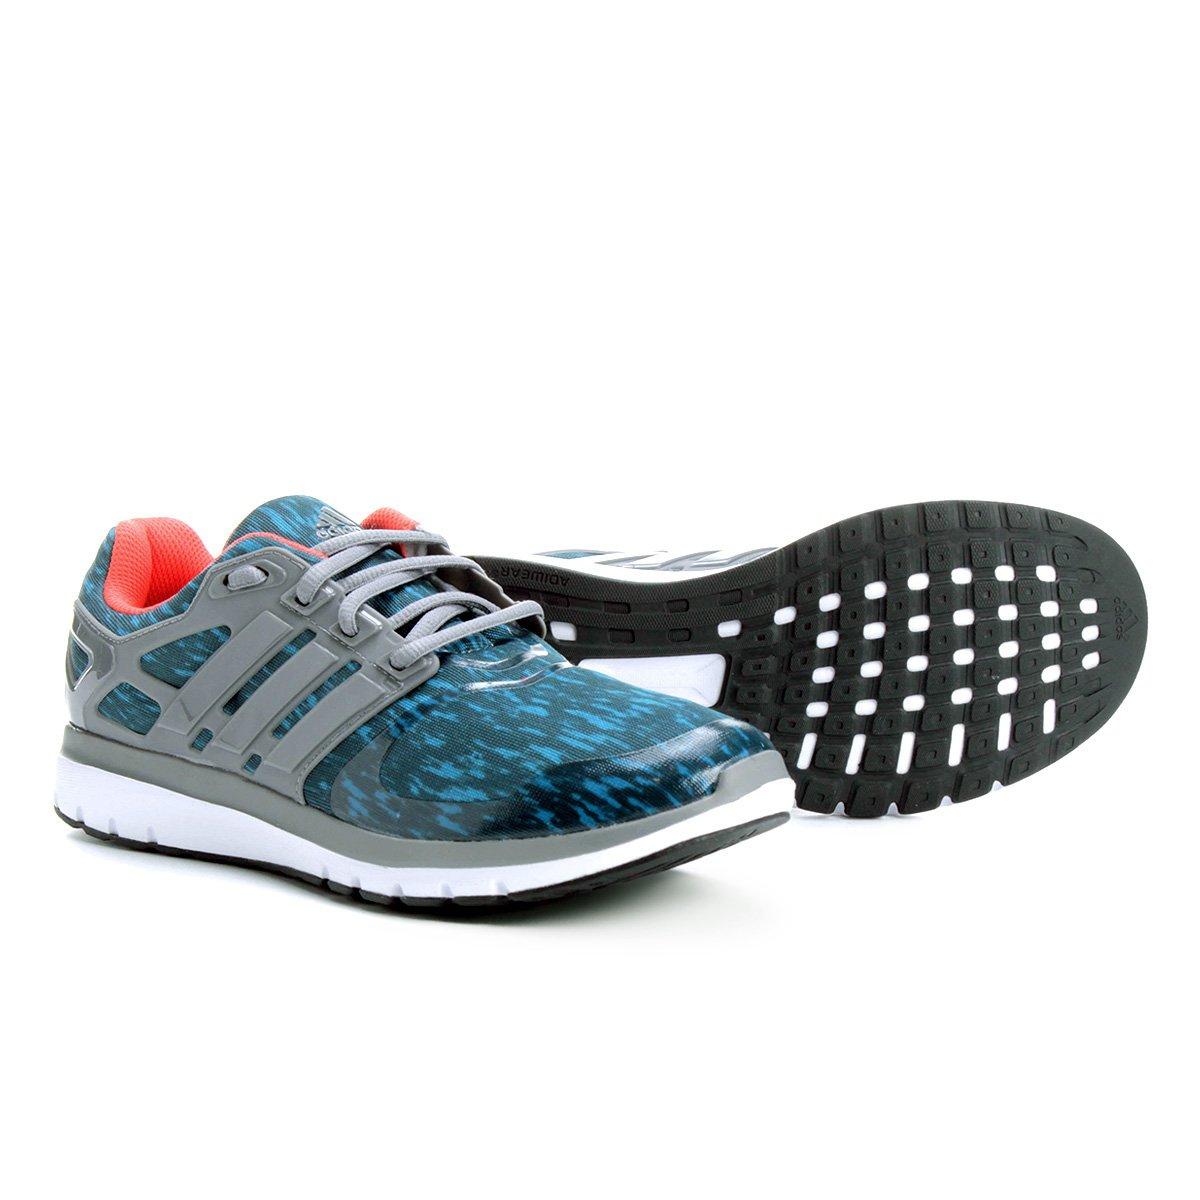 T 234 Nis Adidas Energy Cloud Feminino Azul Claro Compre